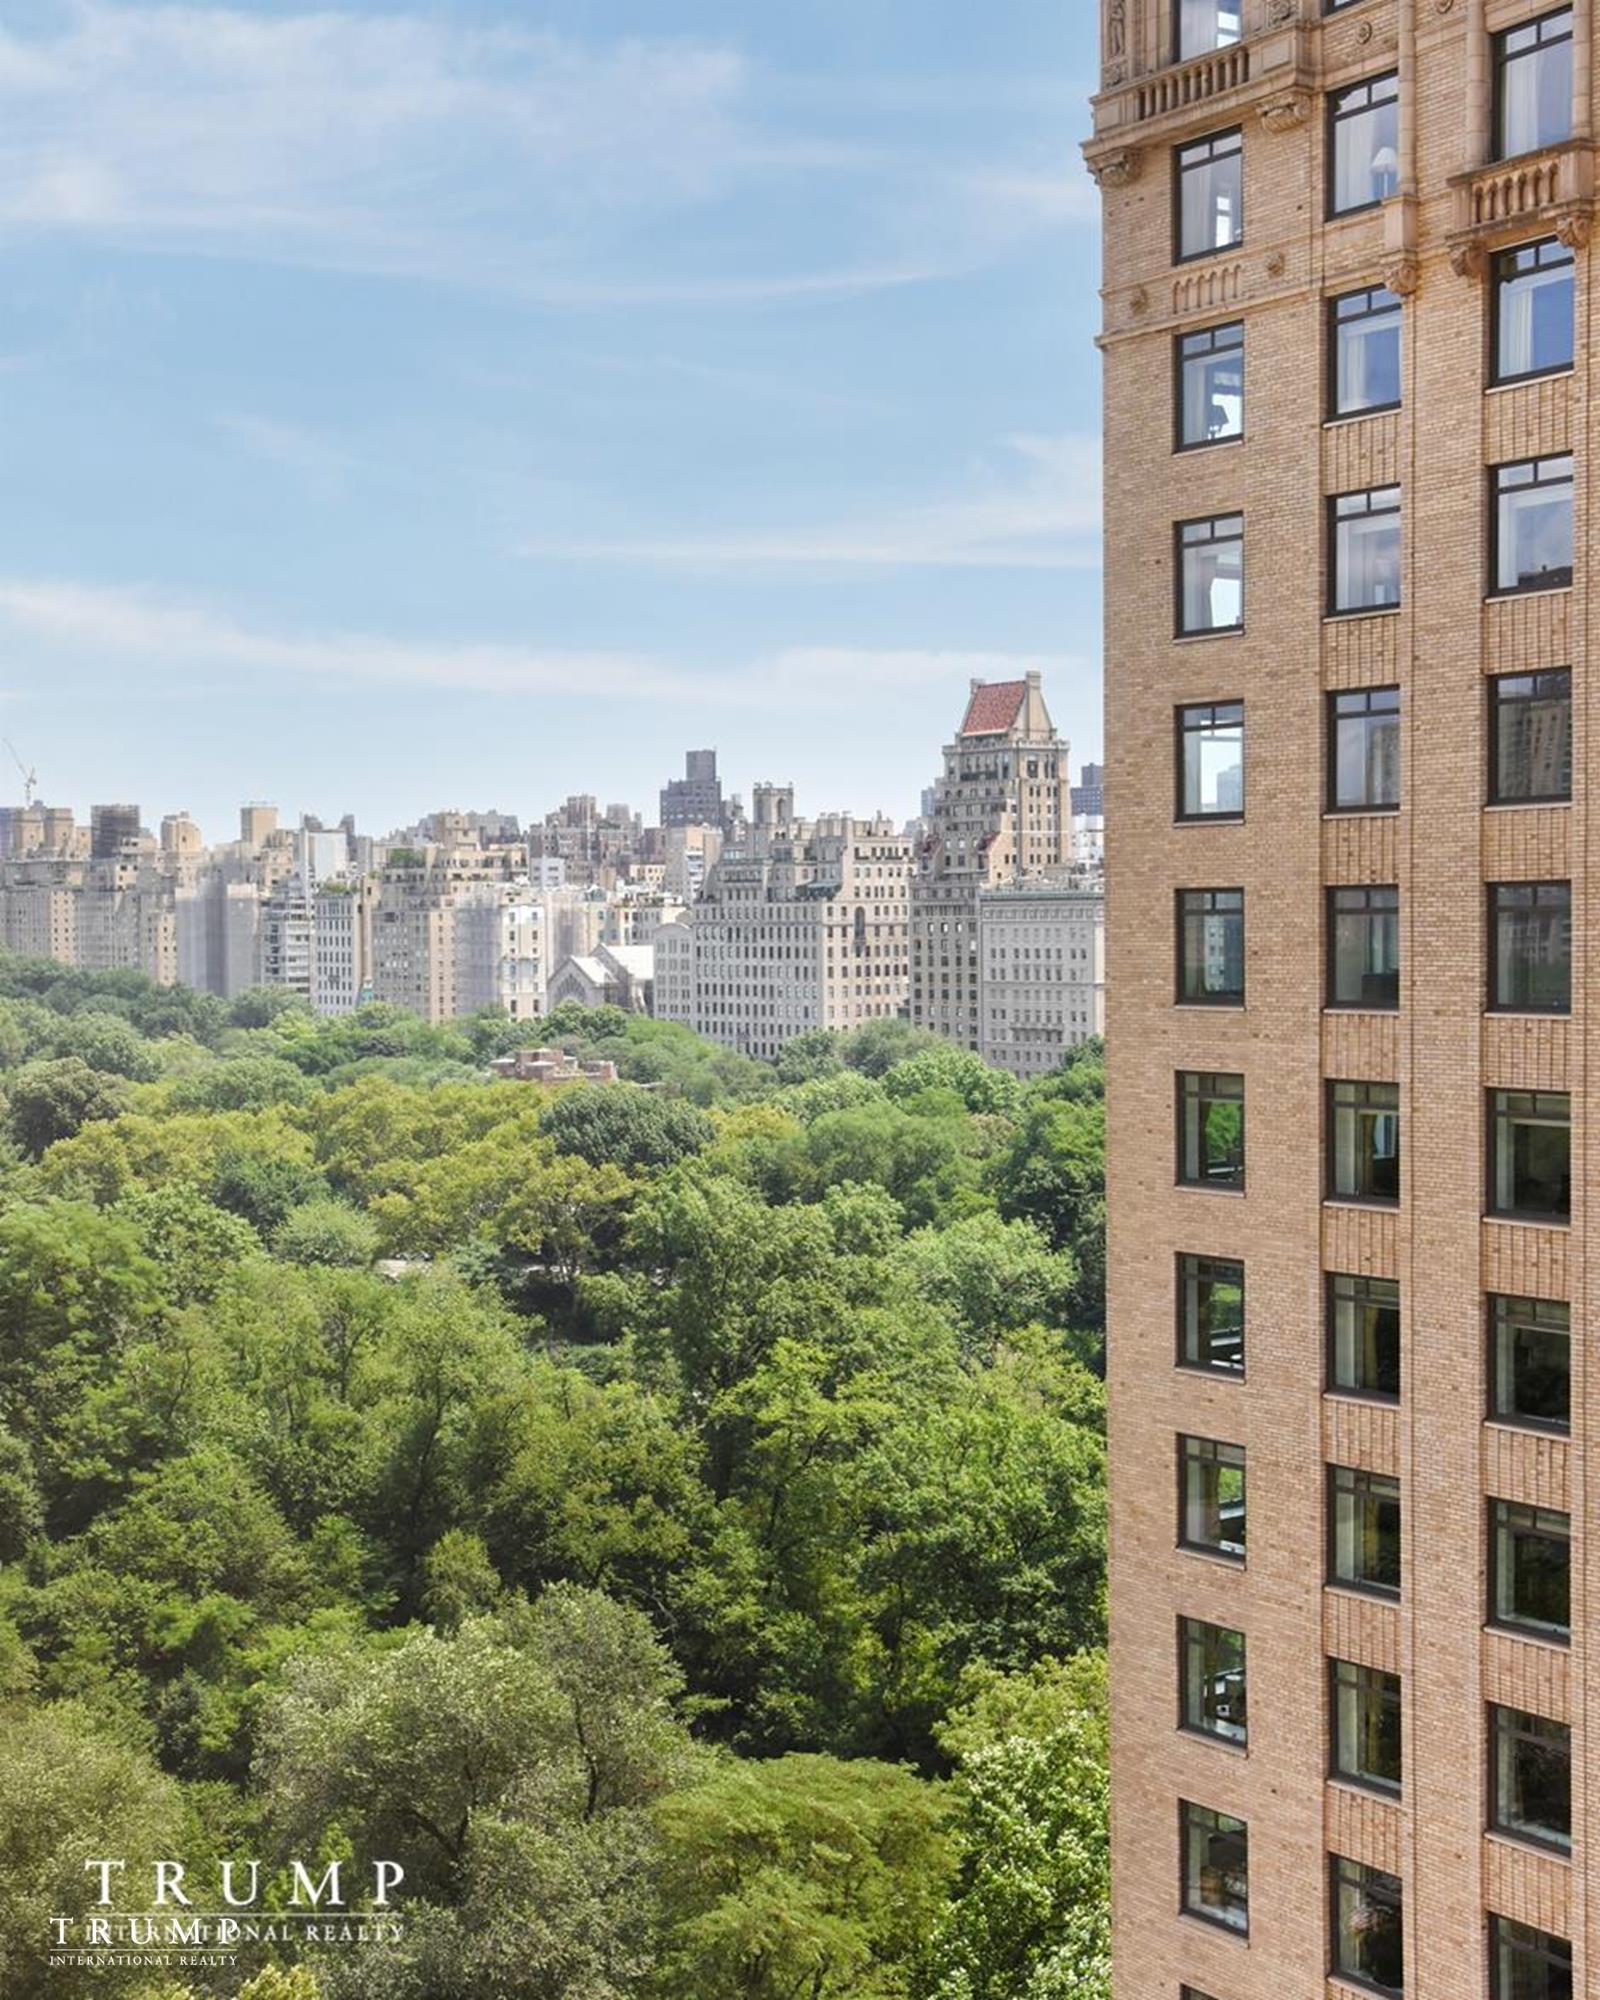 Central Park New York Condos: 106 Central Park South 16-G, New York, NY 10019